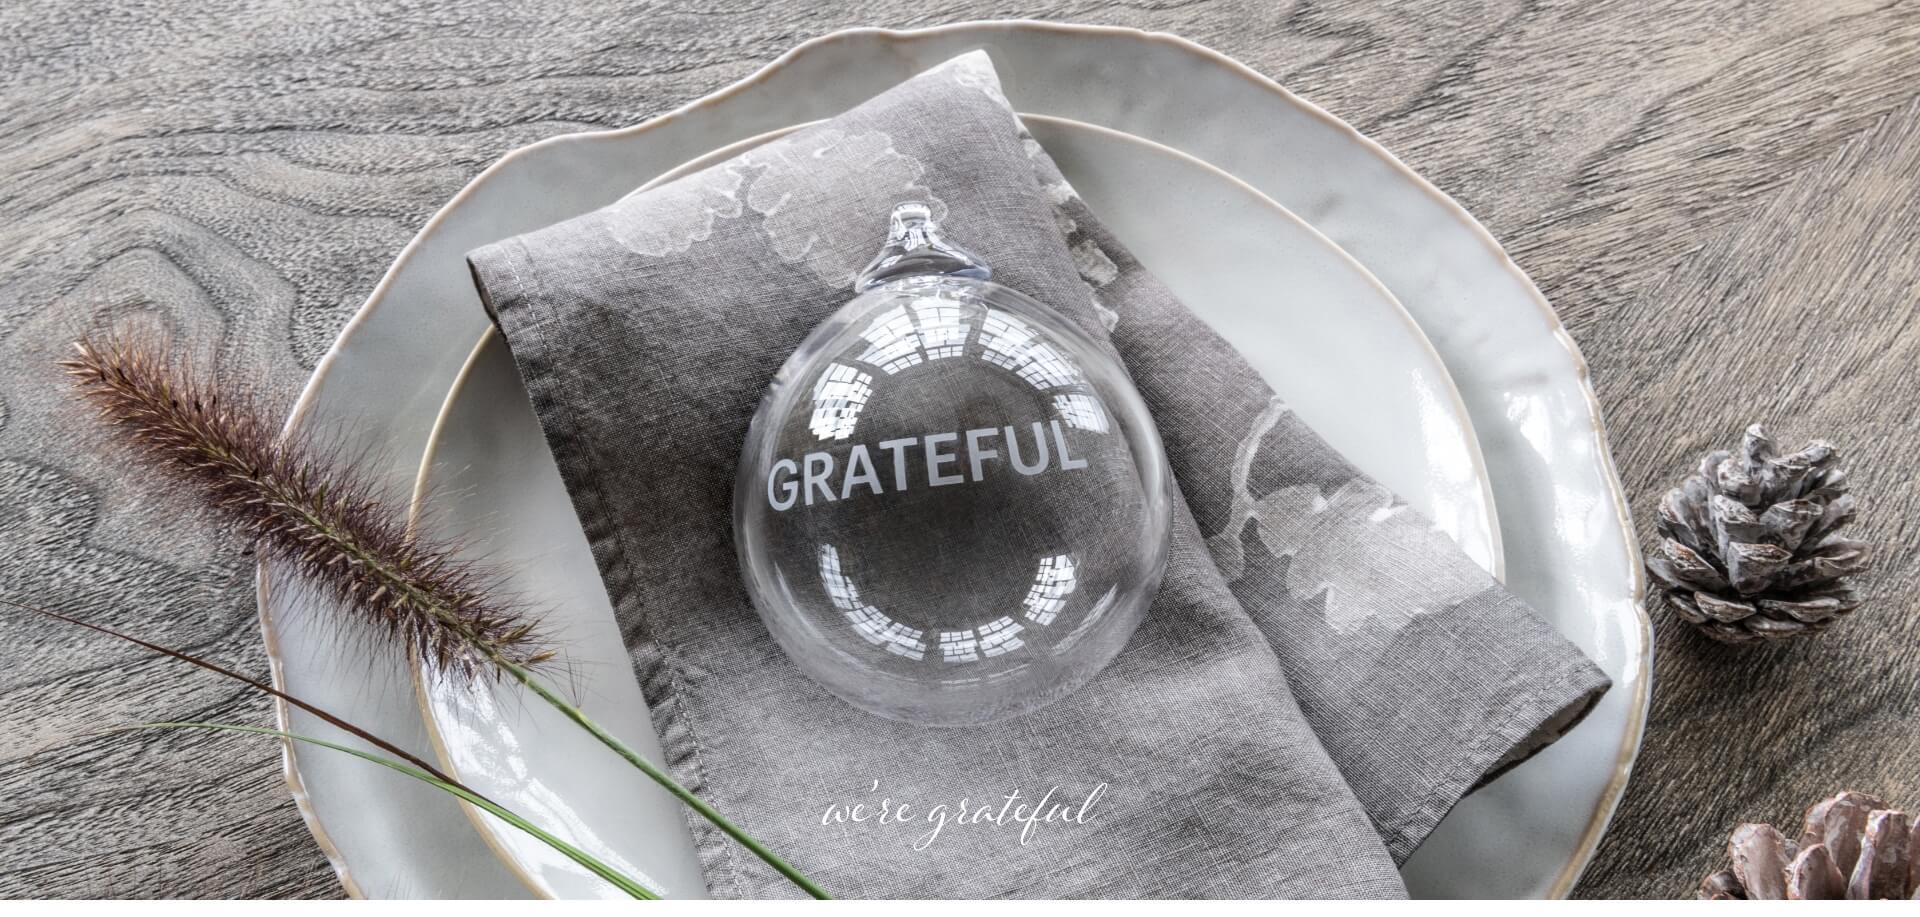 We're Grateful - LoveYourBrain